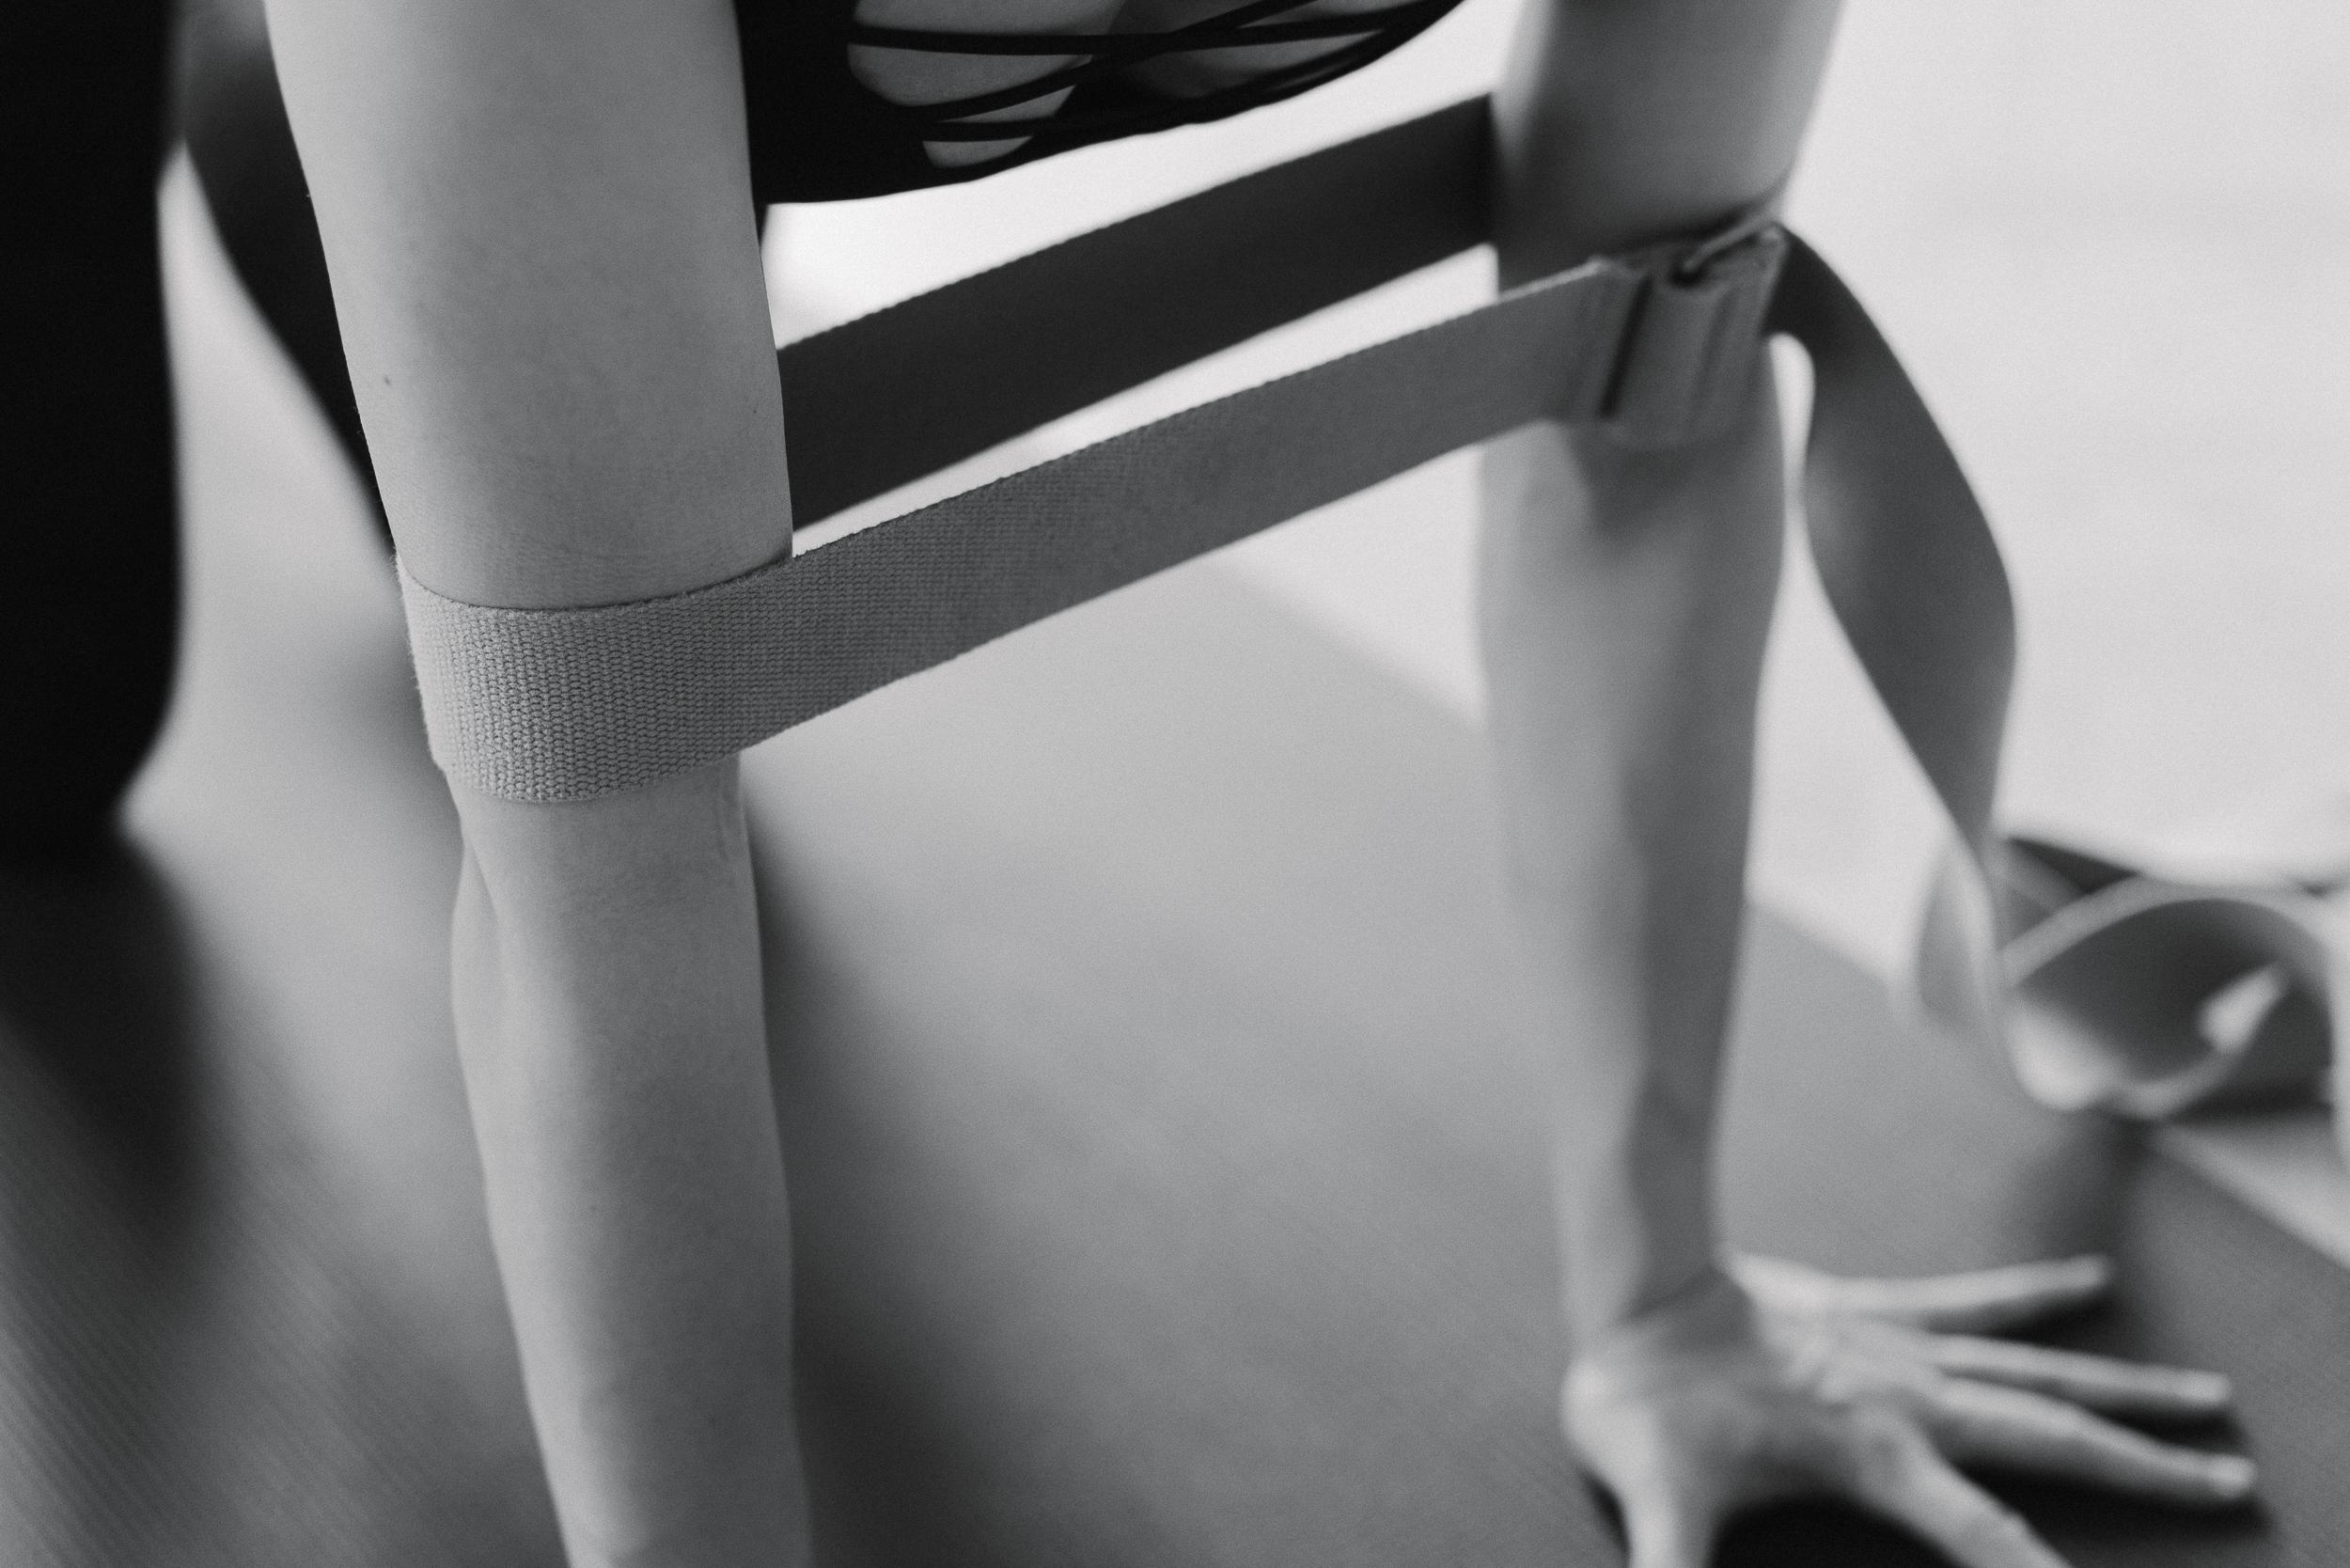 Little-Mandarin-Yoga-Studio Chaturanga-with-strap.jpg